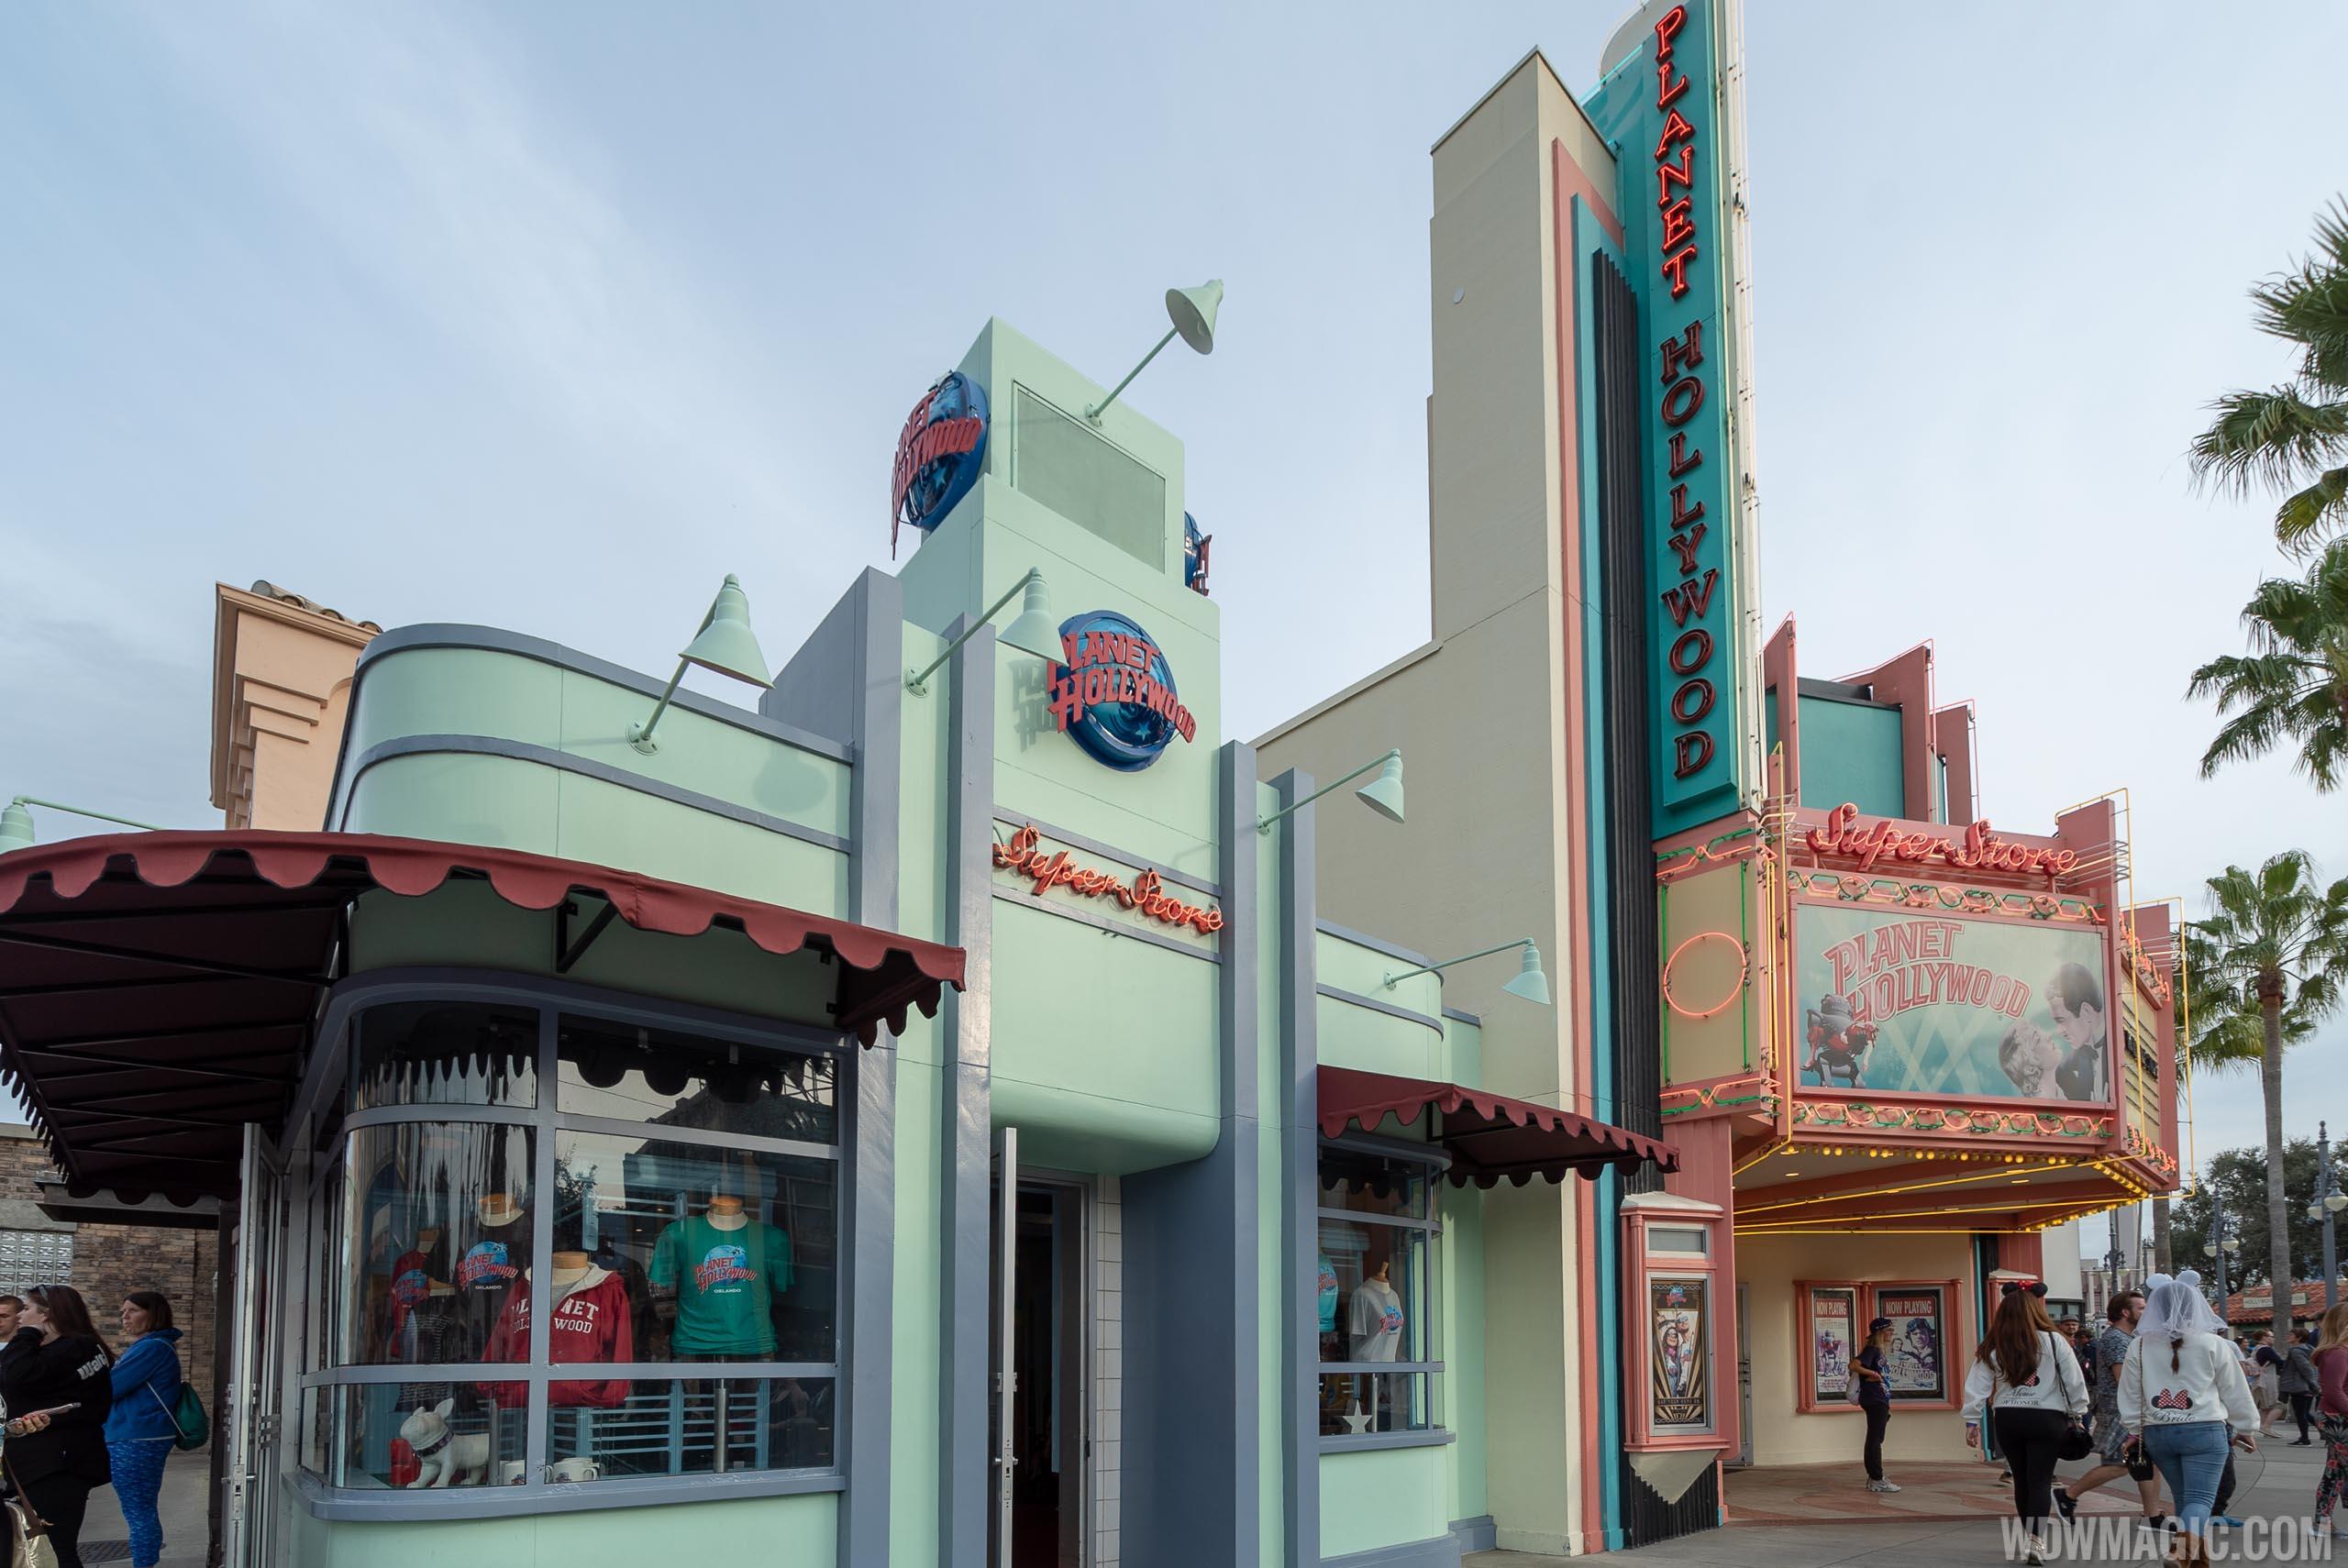 Planert Hollywood Superstore